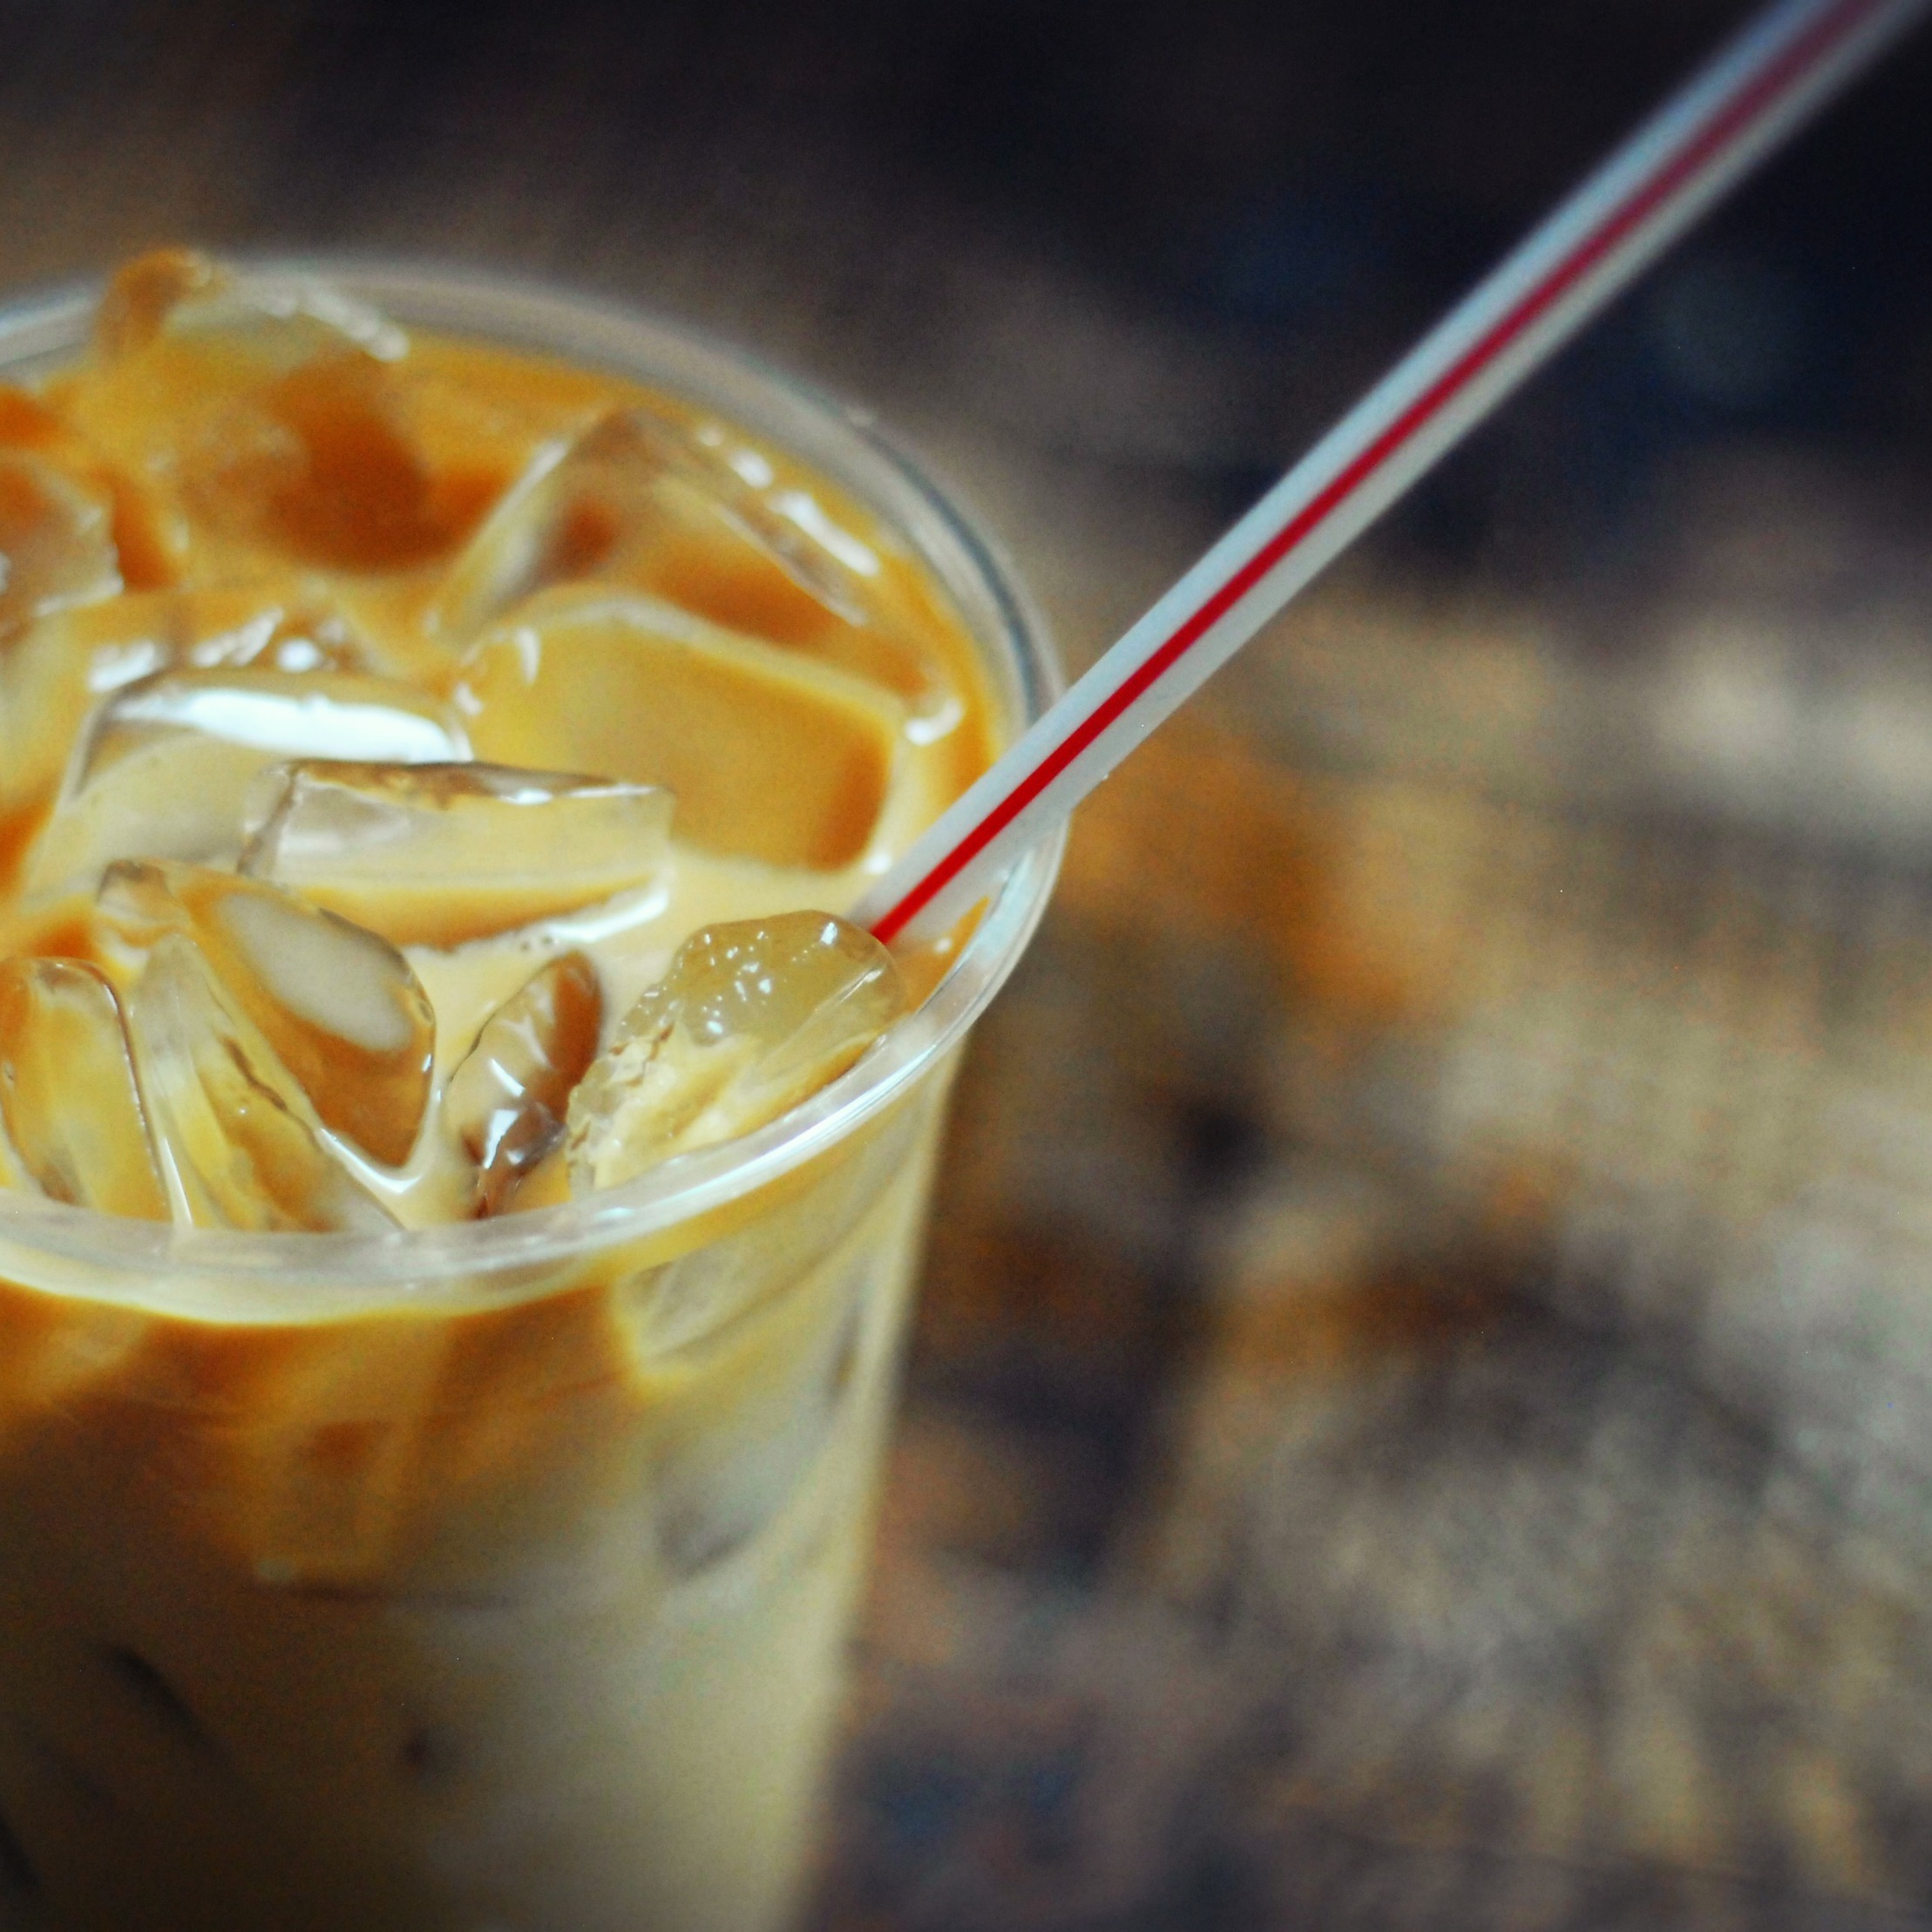 iced coffee with straw 2.jpg